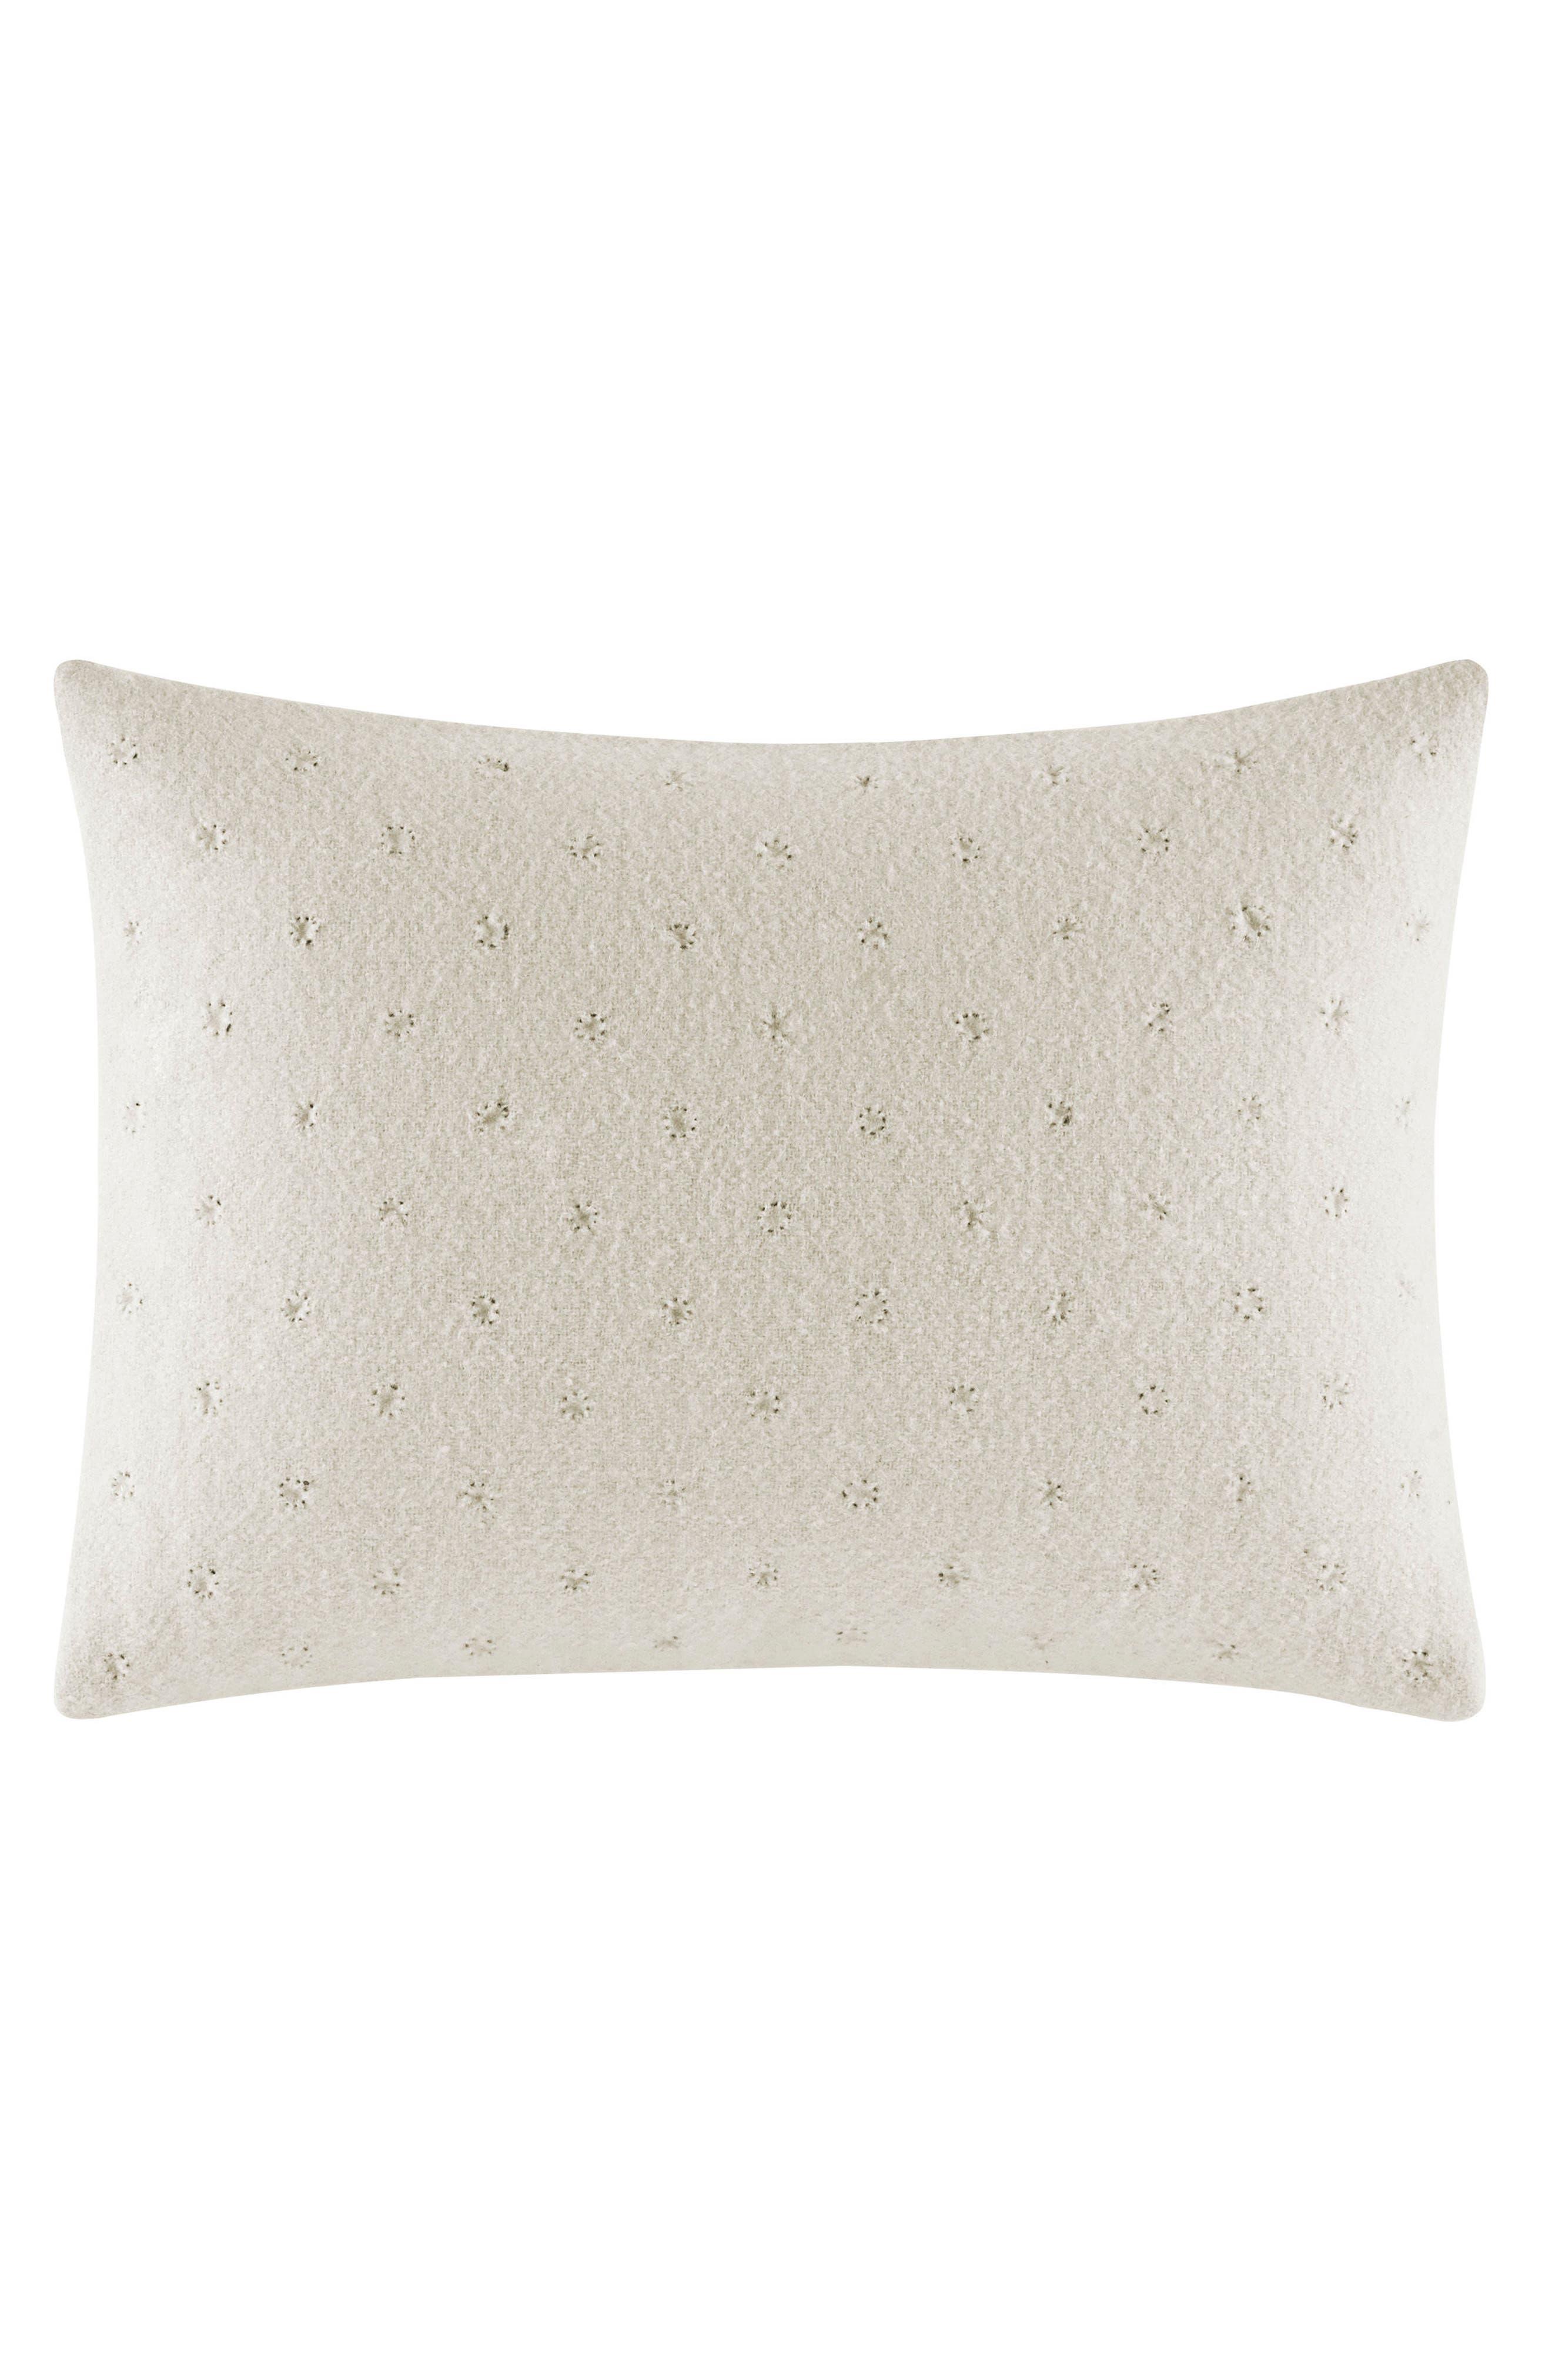 Alternate Image 1 Selected - Vera Wang Passementerie Breakfast Accent Pillow